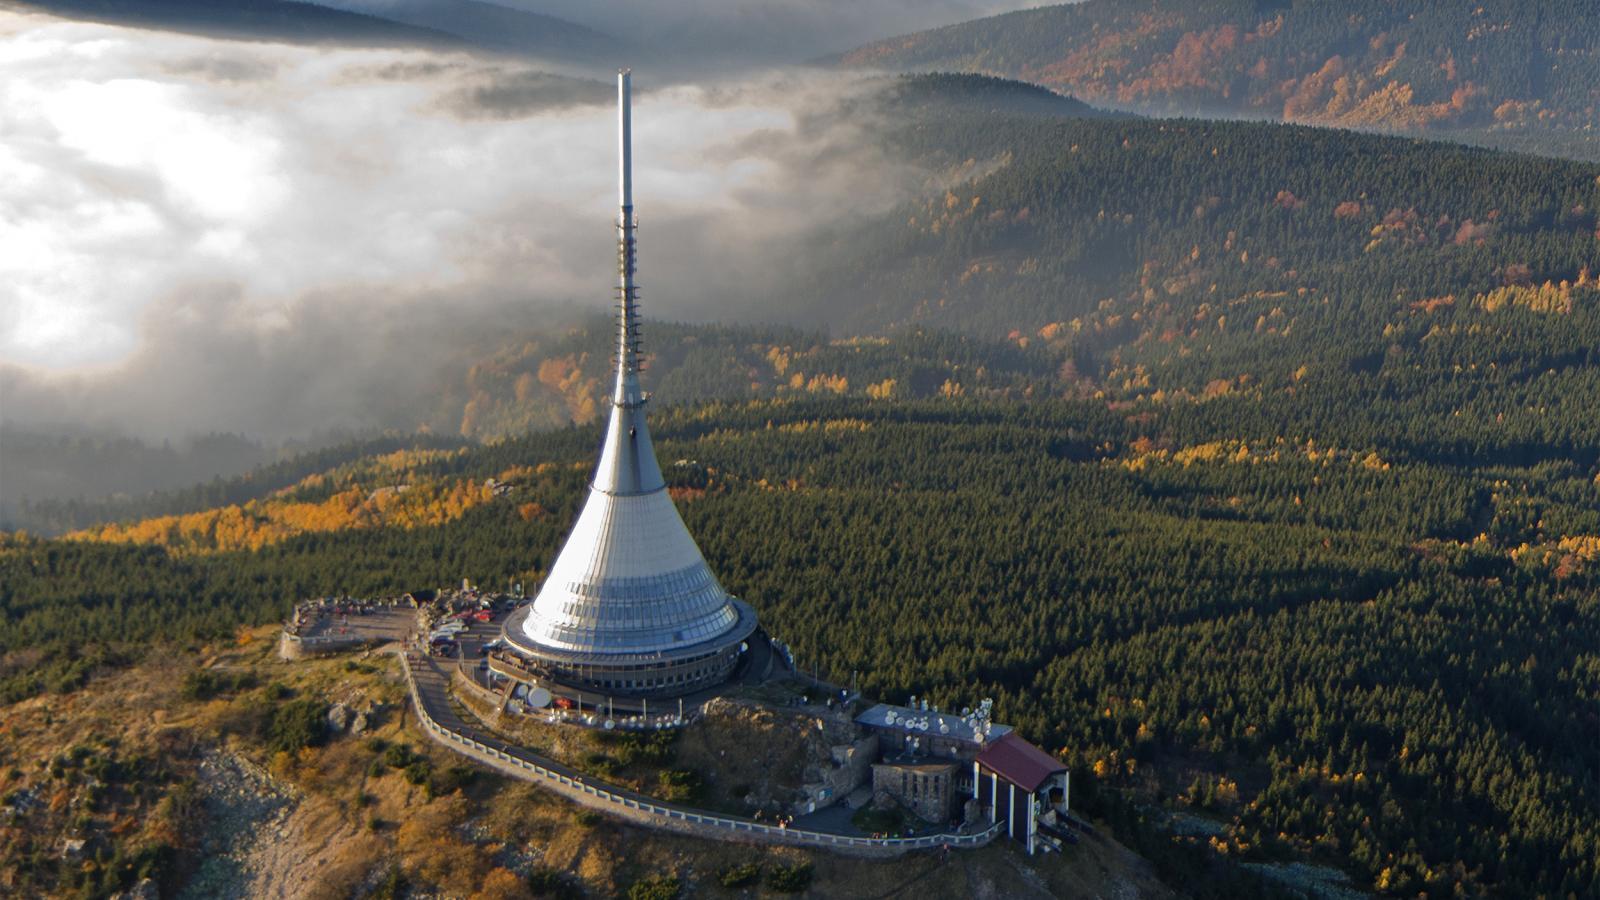 Volby do zastupitelstva Libereckého kraje